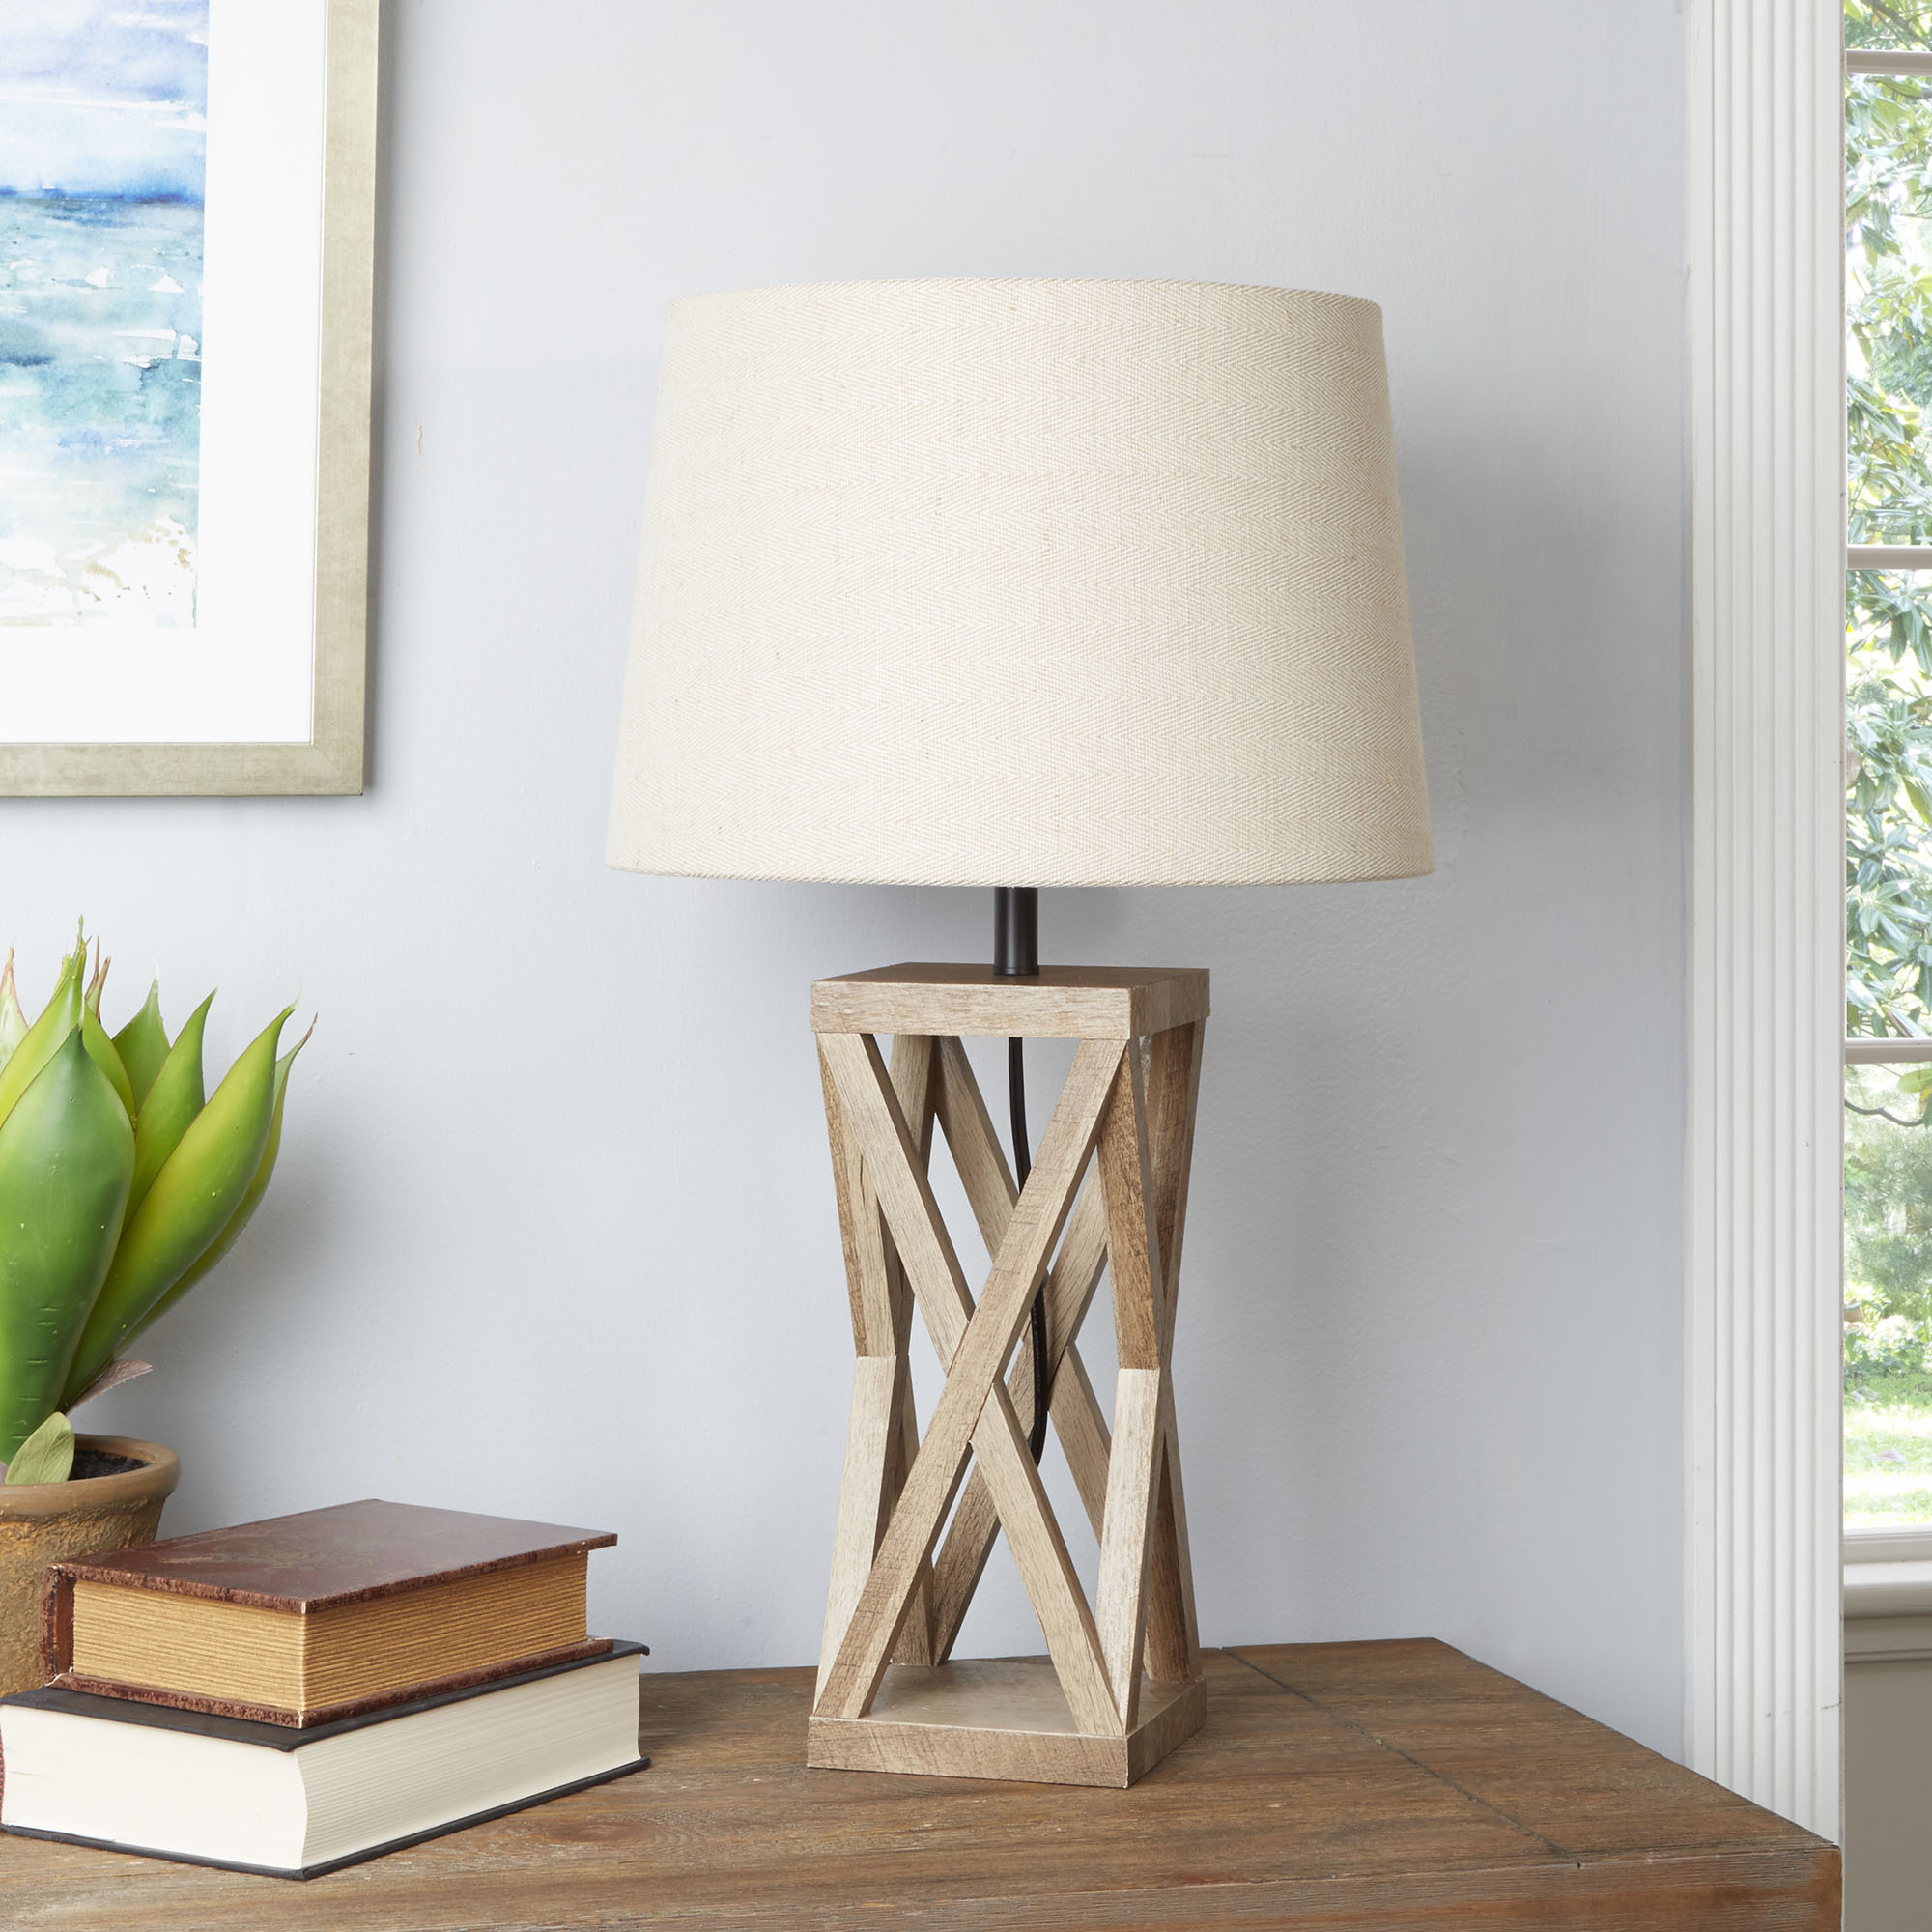 Better Homes & Gardens X Frame Lamp Base, Weathered Finish